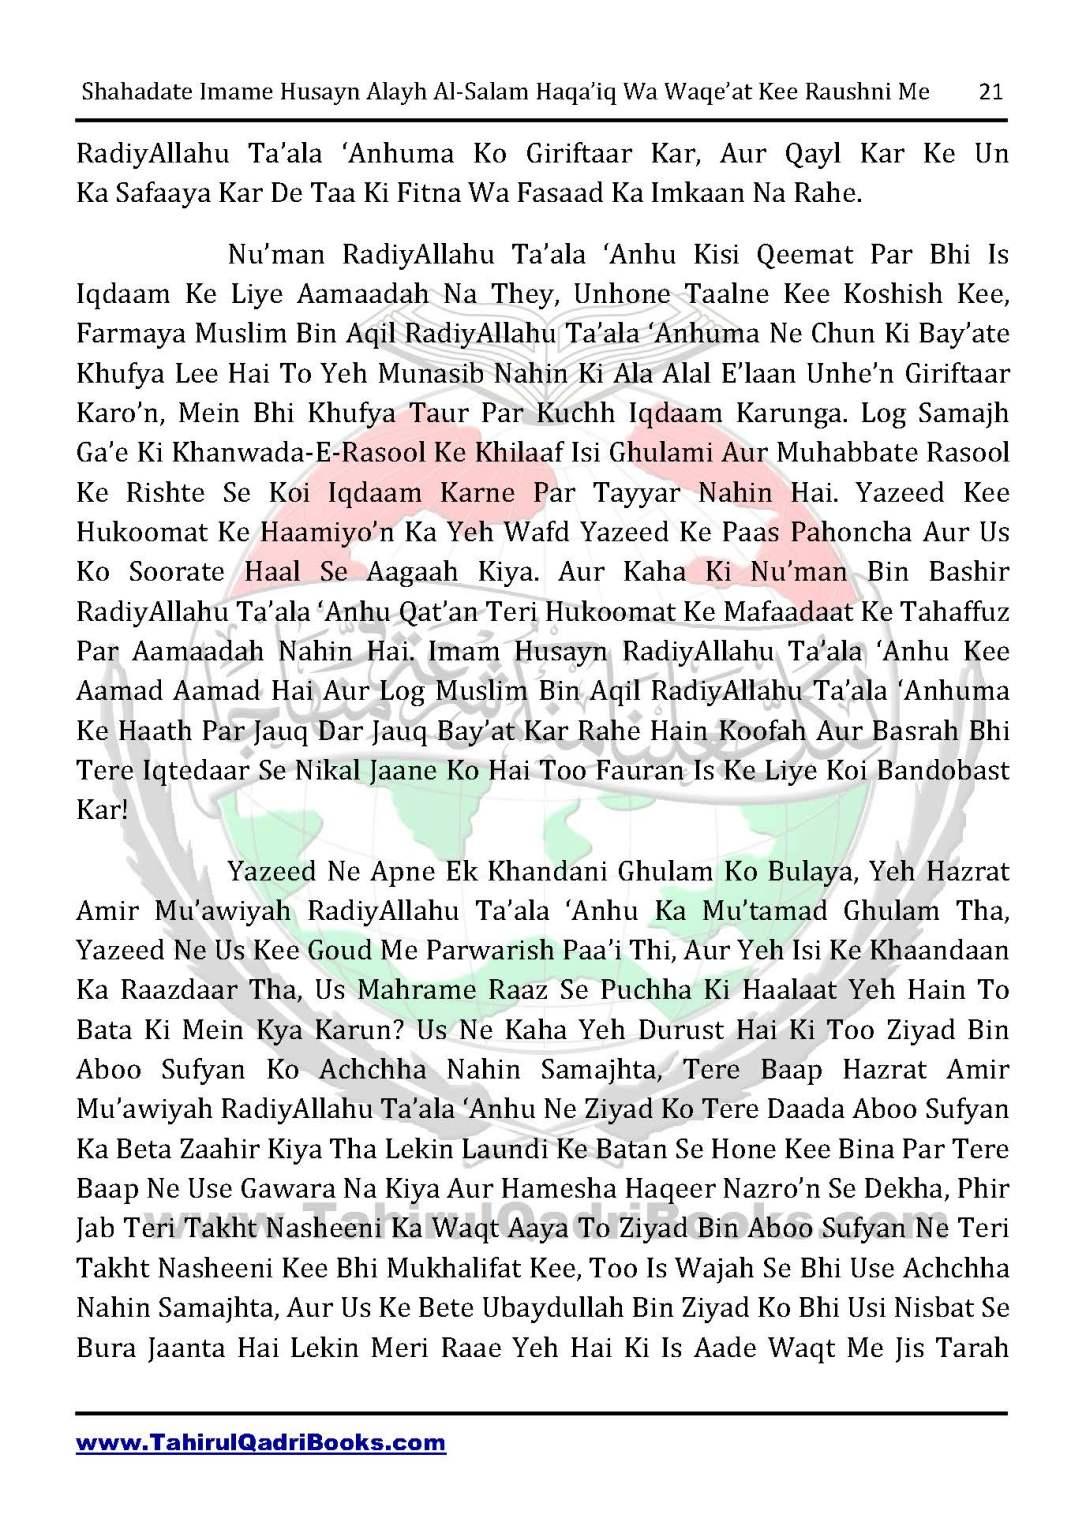 shahadate-imame-husayn-alayh-is-salam-haqaiq-wa-waqe_at-kee-raushni-me-in-roman-urdu-unlocked_Page_21